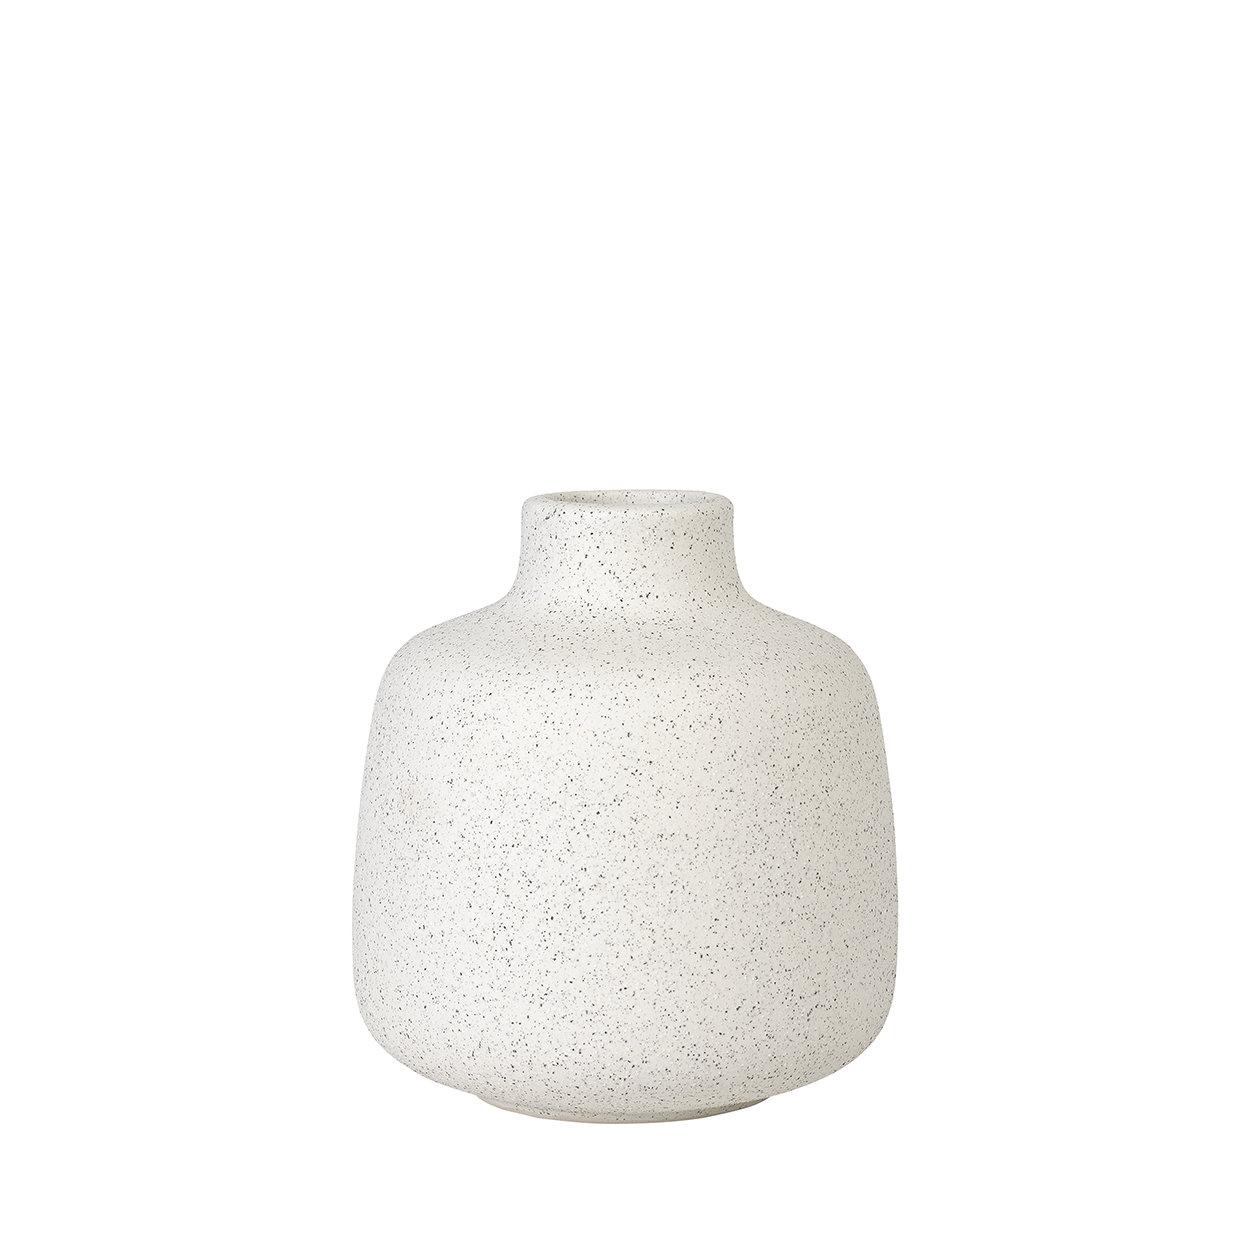 Blomus Rudea 5 32 Ceramic Table Vase Reviews Wayfair